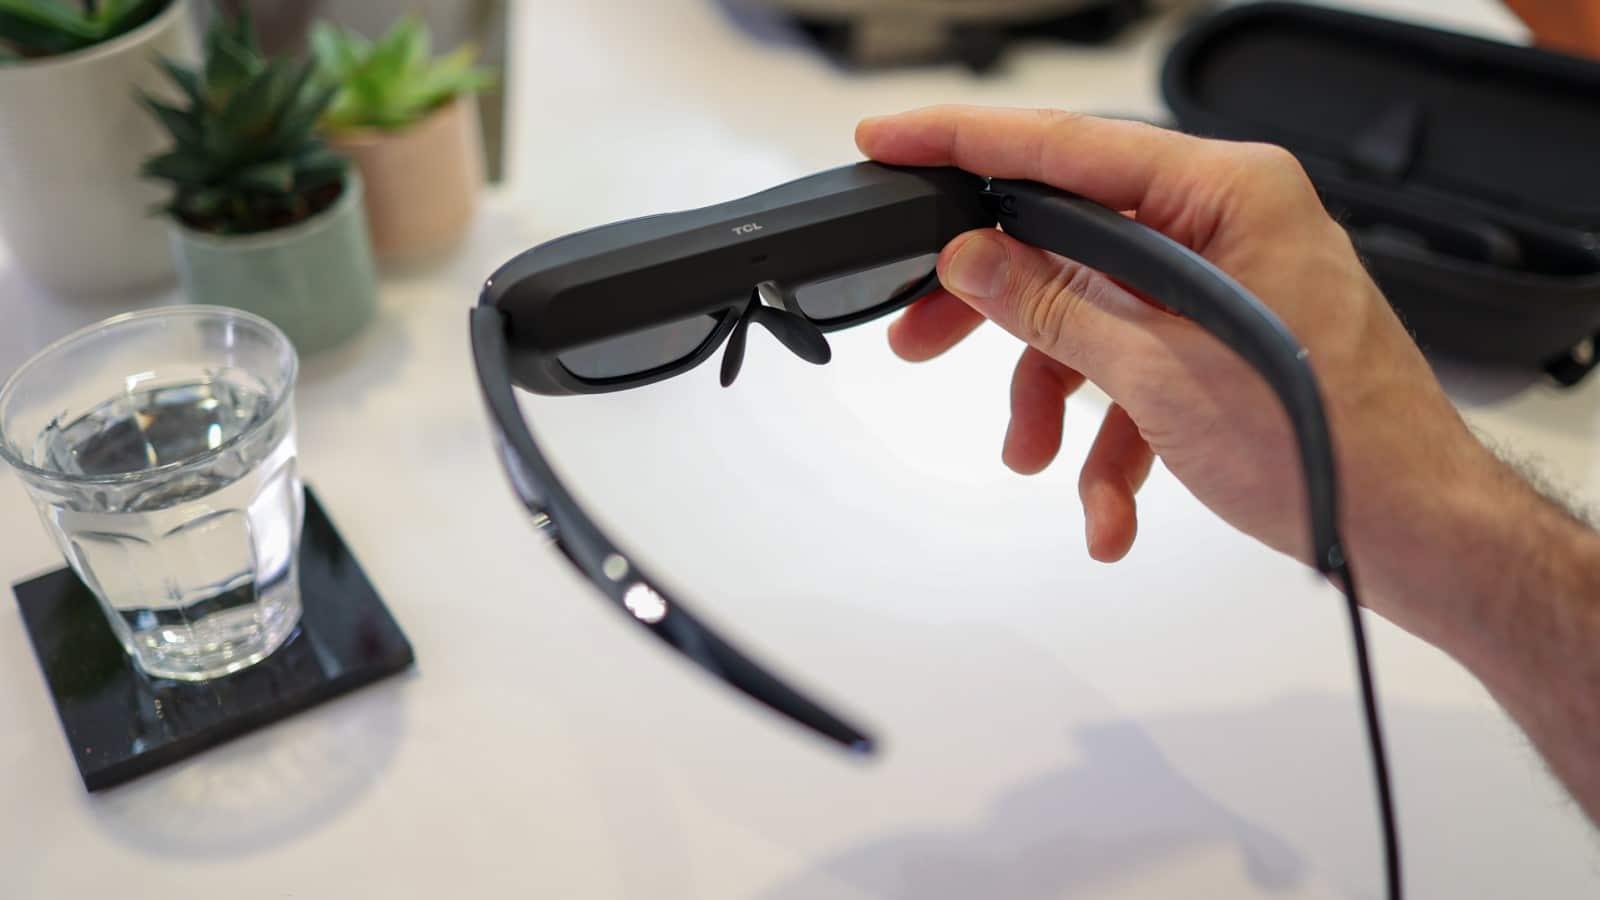 tcl nxtwear-g smart glasses